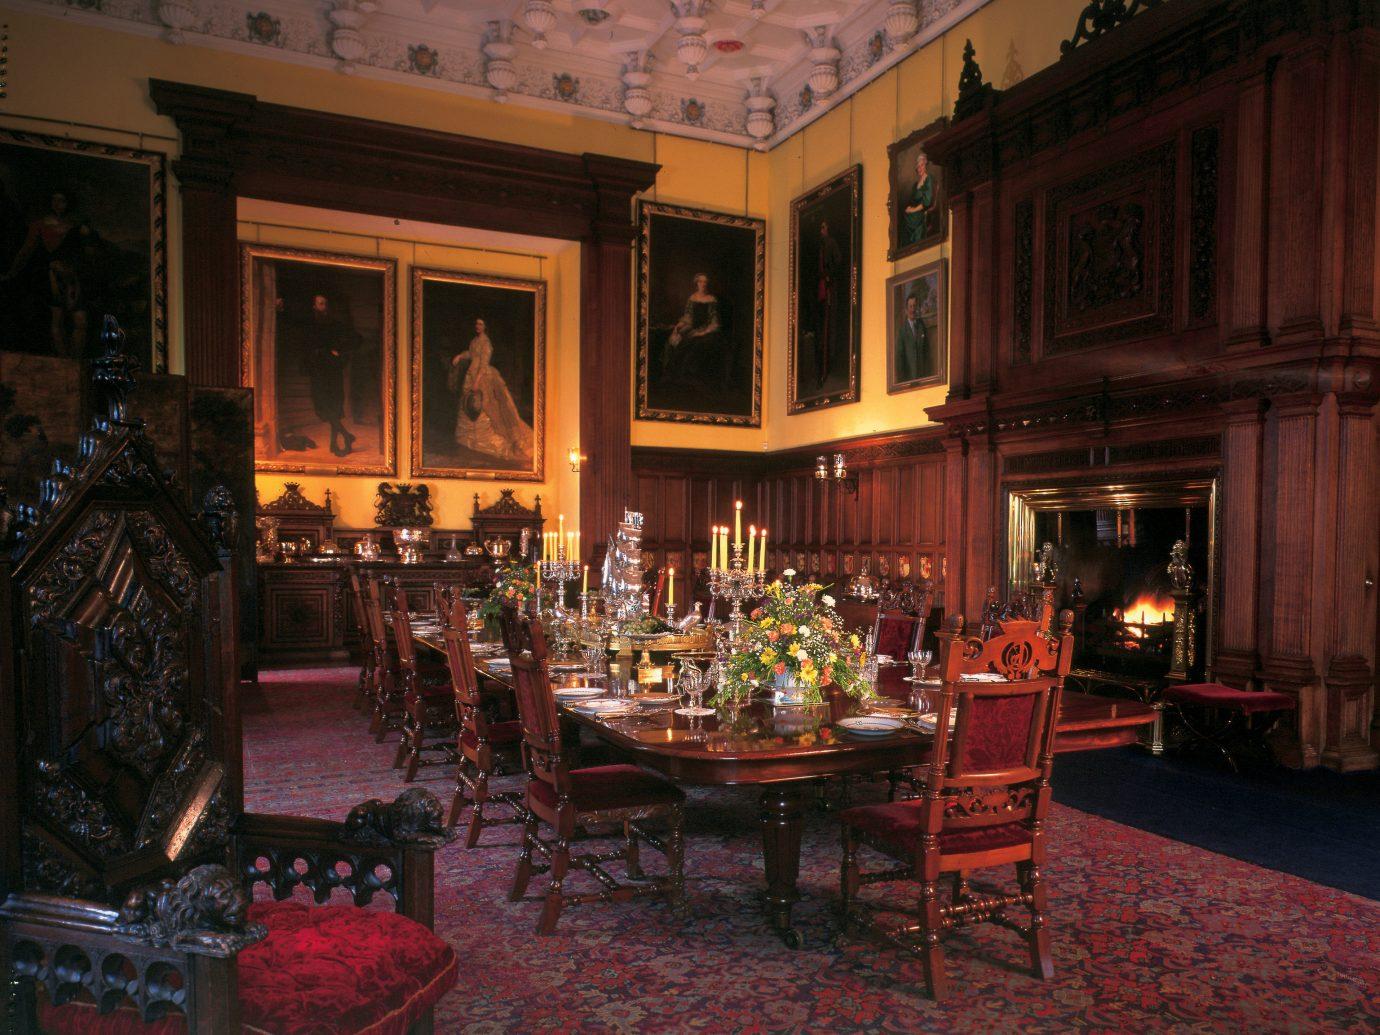 Landmarks Offbeat indoor function hall interior design Lobby restaurant dining room ballroom furniture